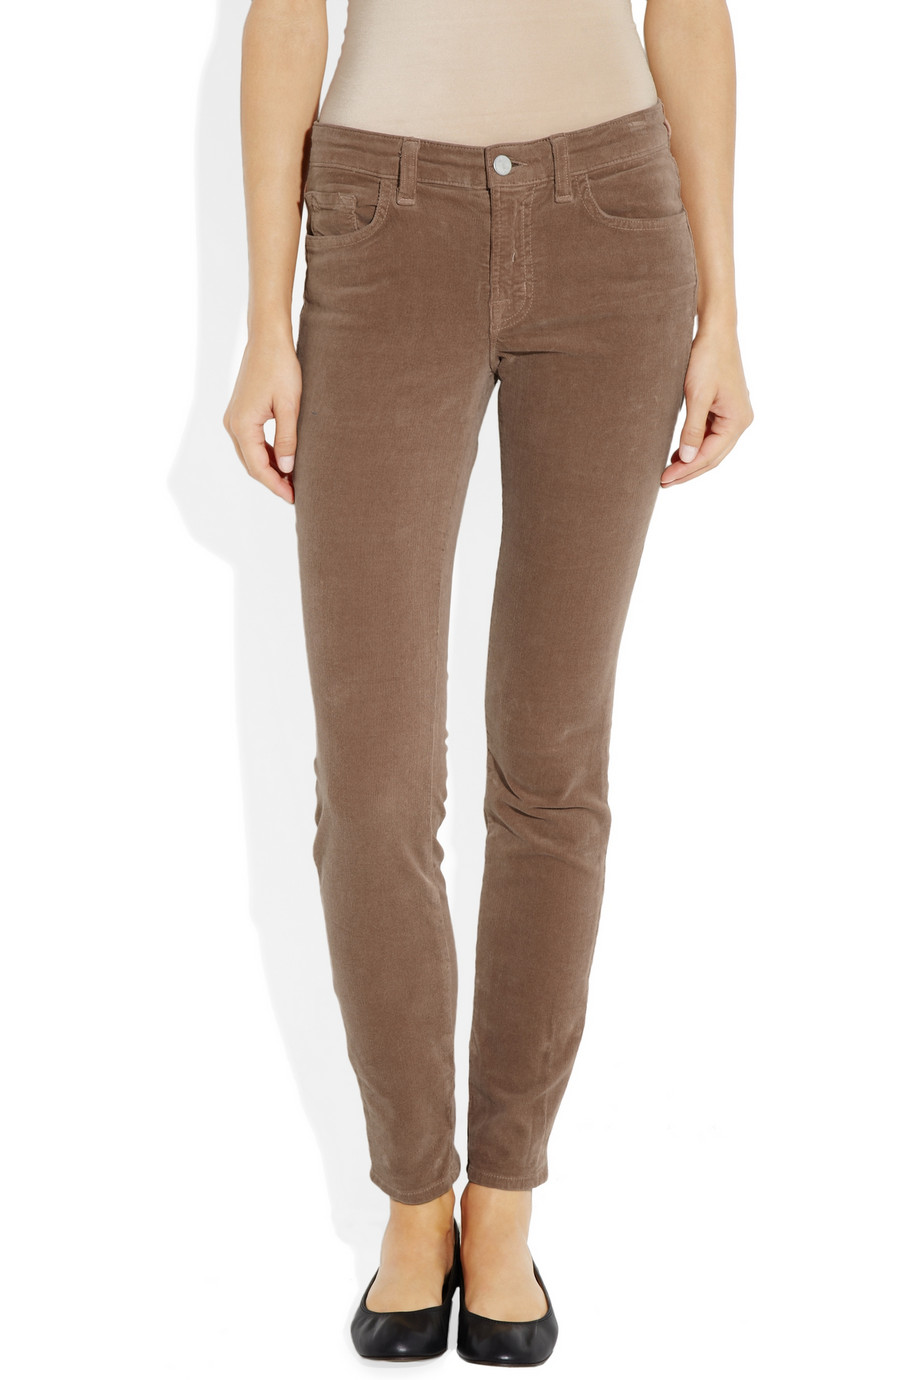 J brand 511 mid rise corduroy skinny jeans